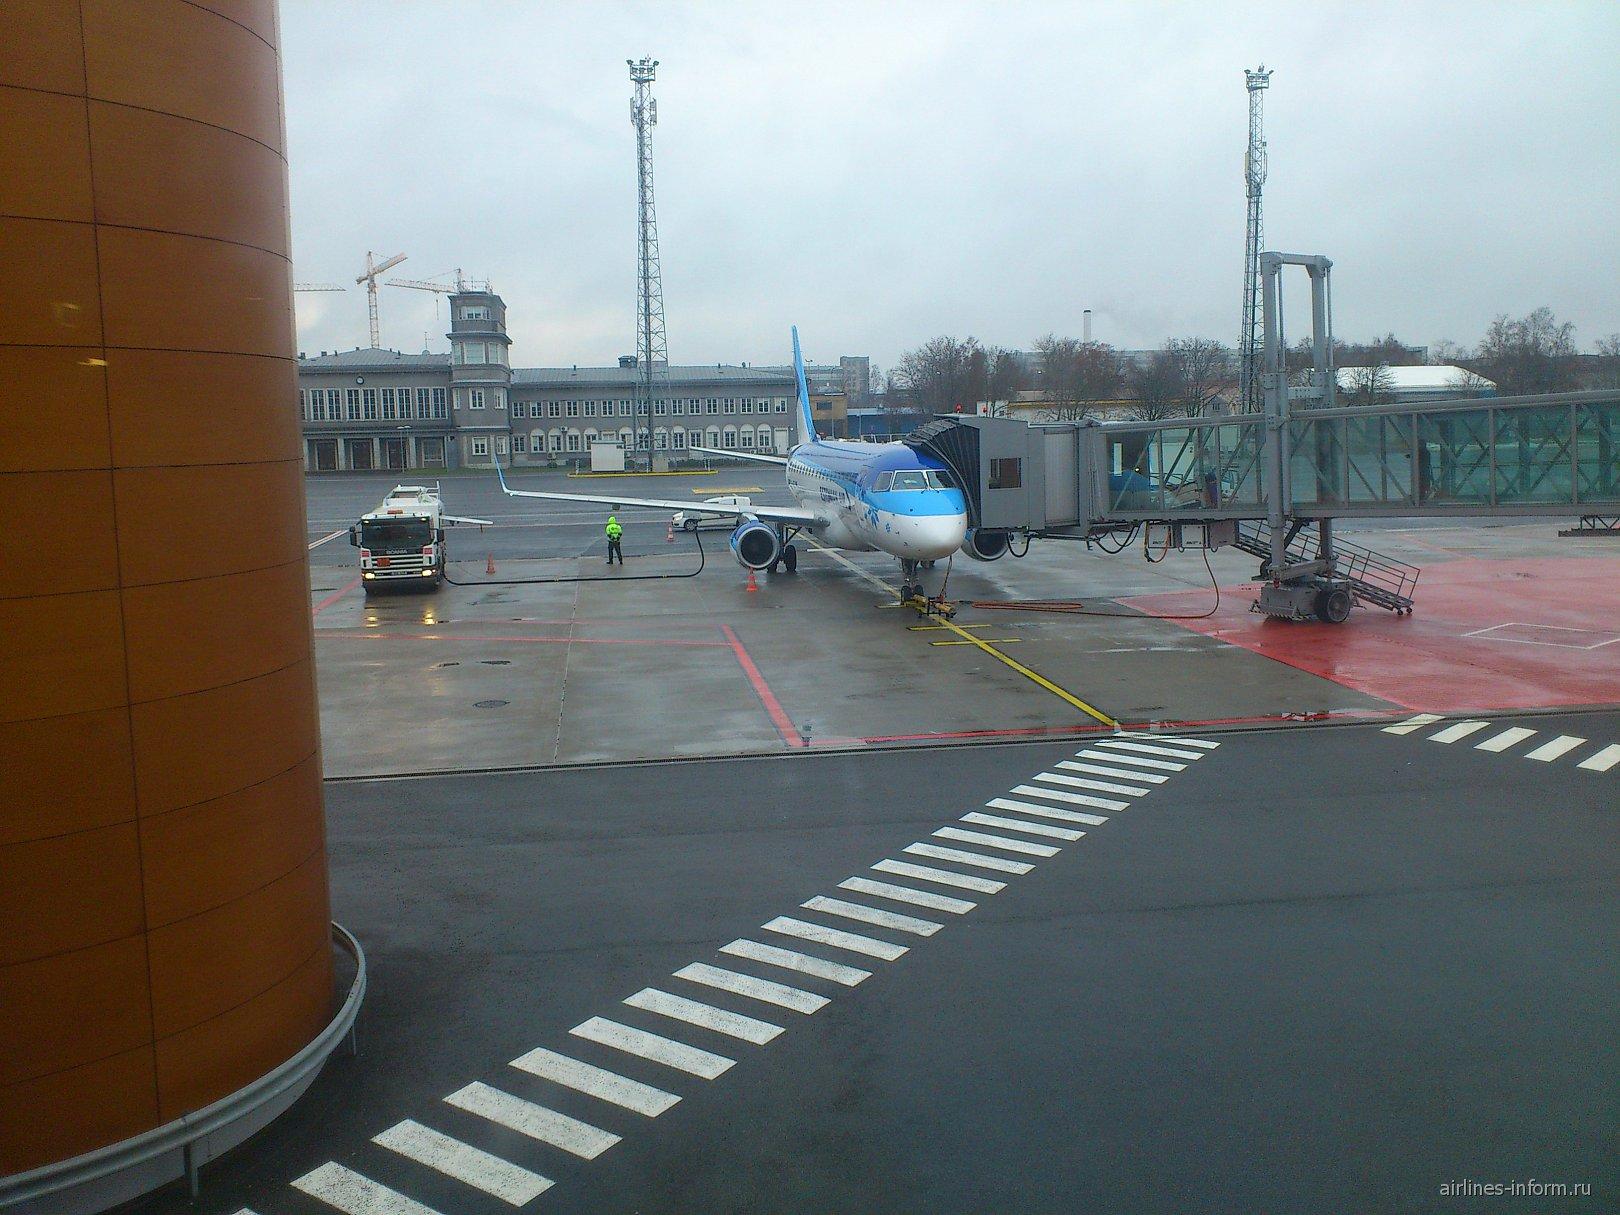 Embraer 170 авиакомпании Estonian Air в аэропорту Таллинн